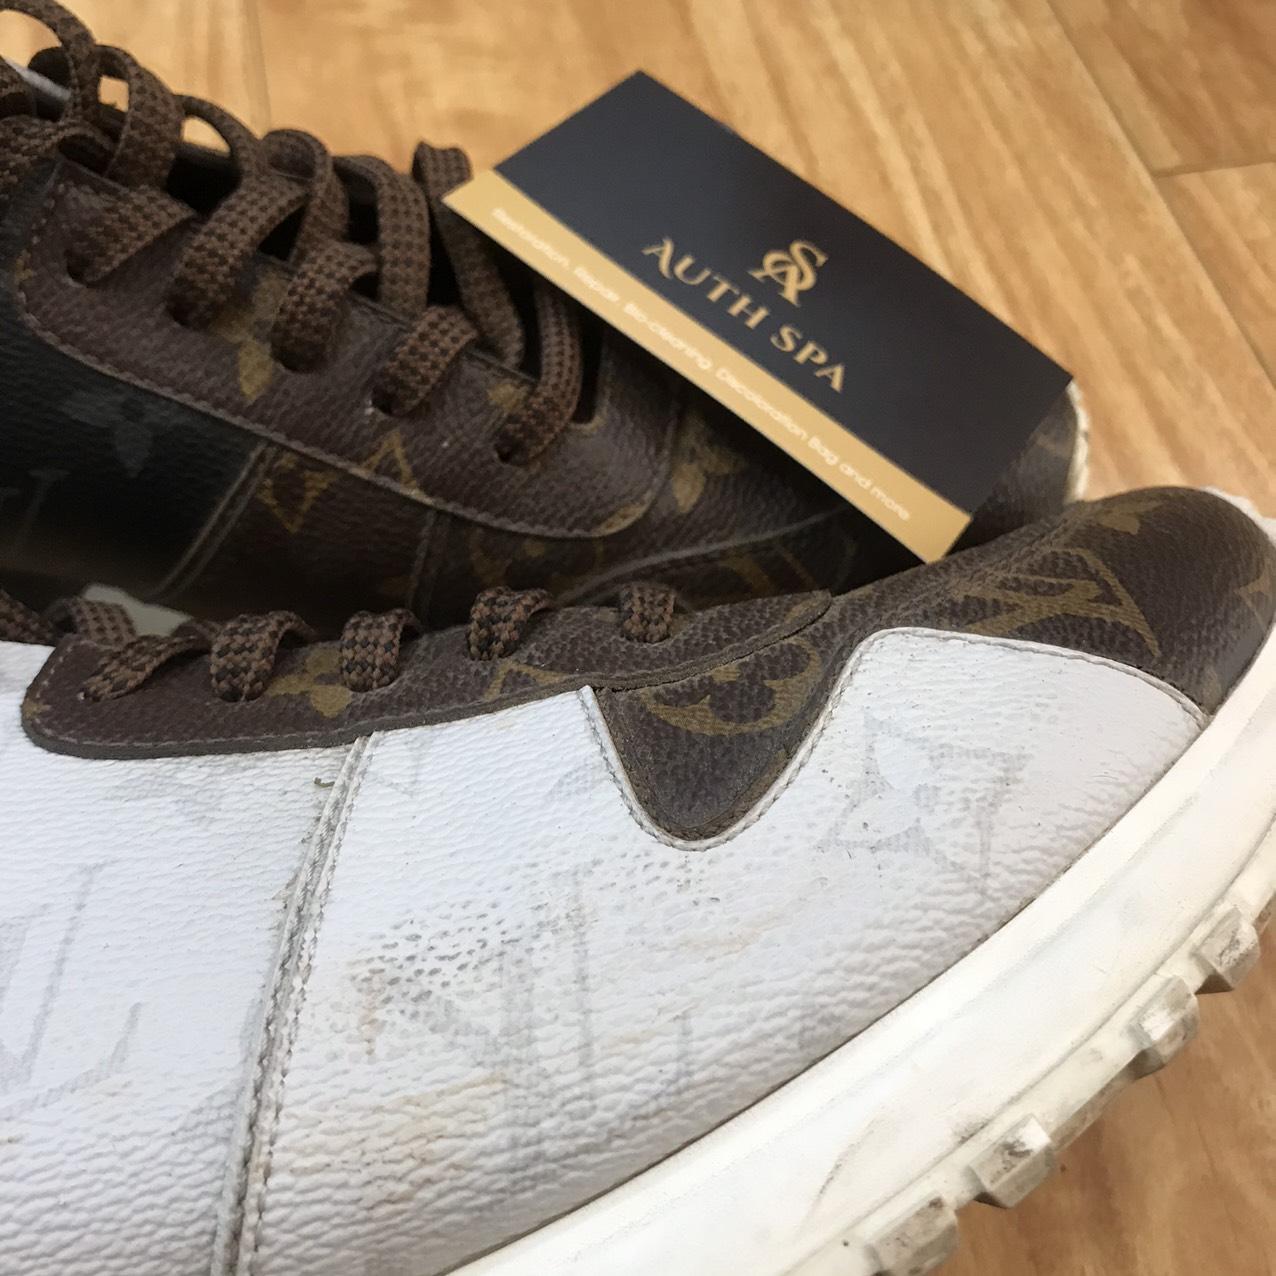 Sửa Chữa Giày Dép Gucci, Chanel, Louis Vuitton, Hermes ... 18